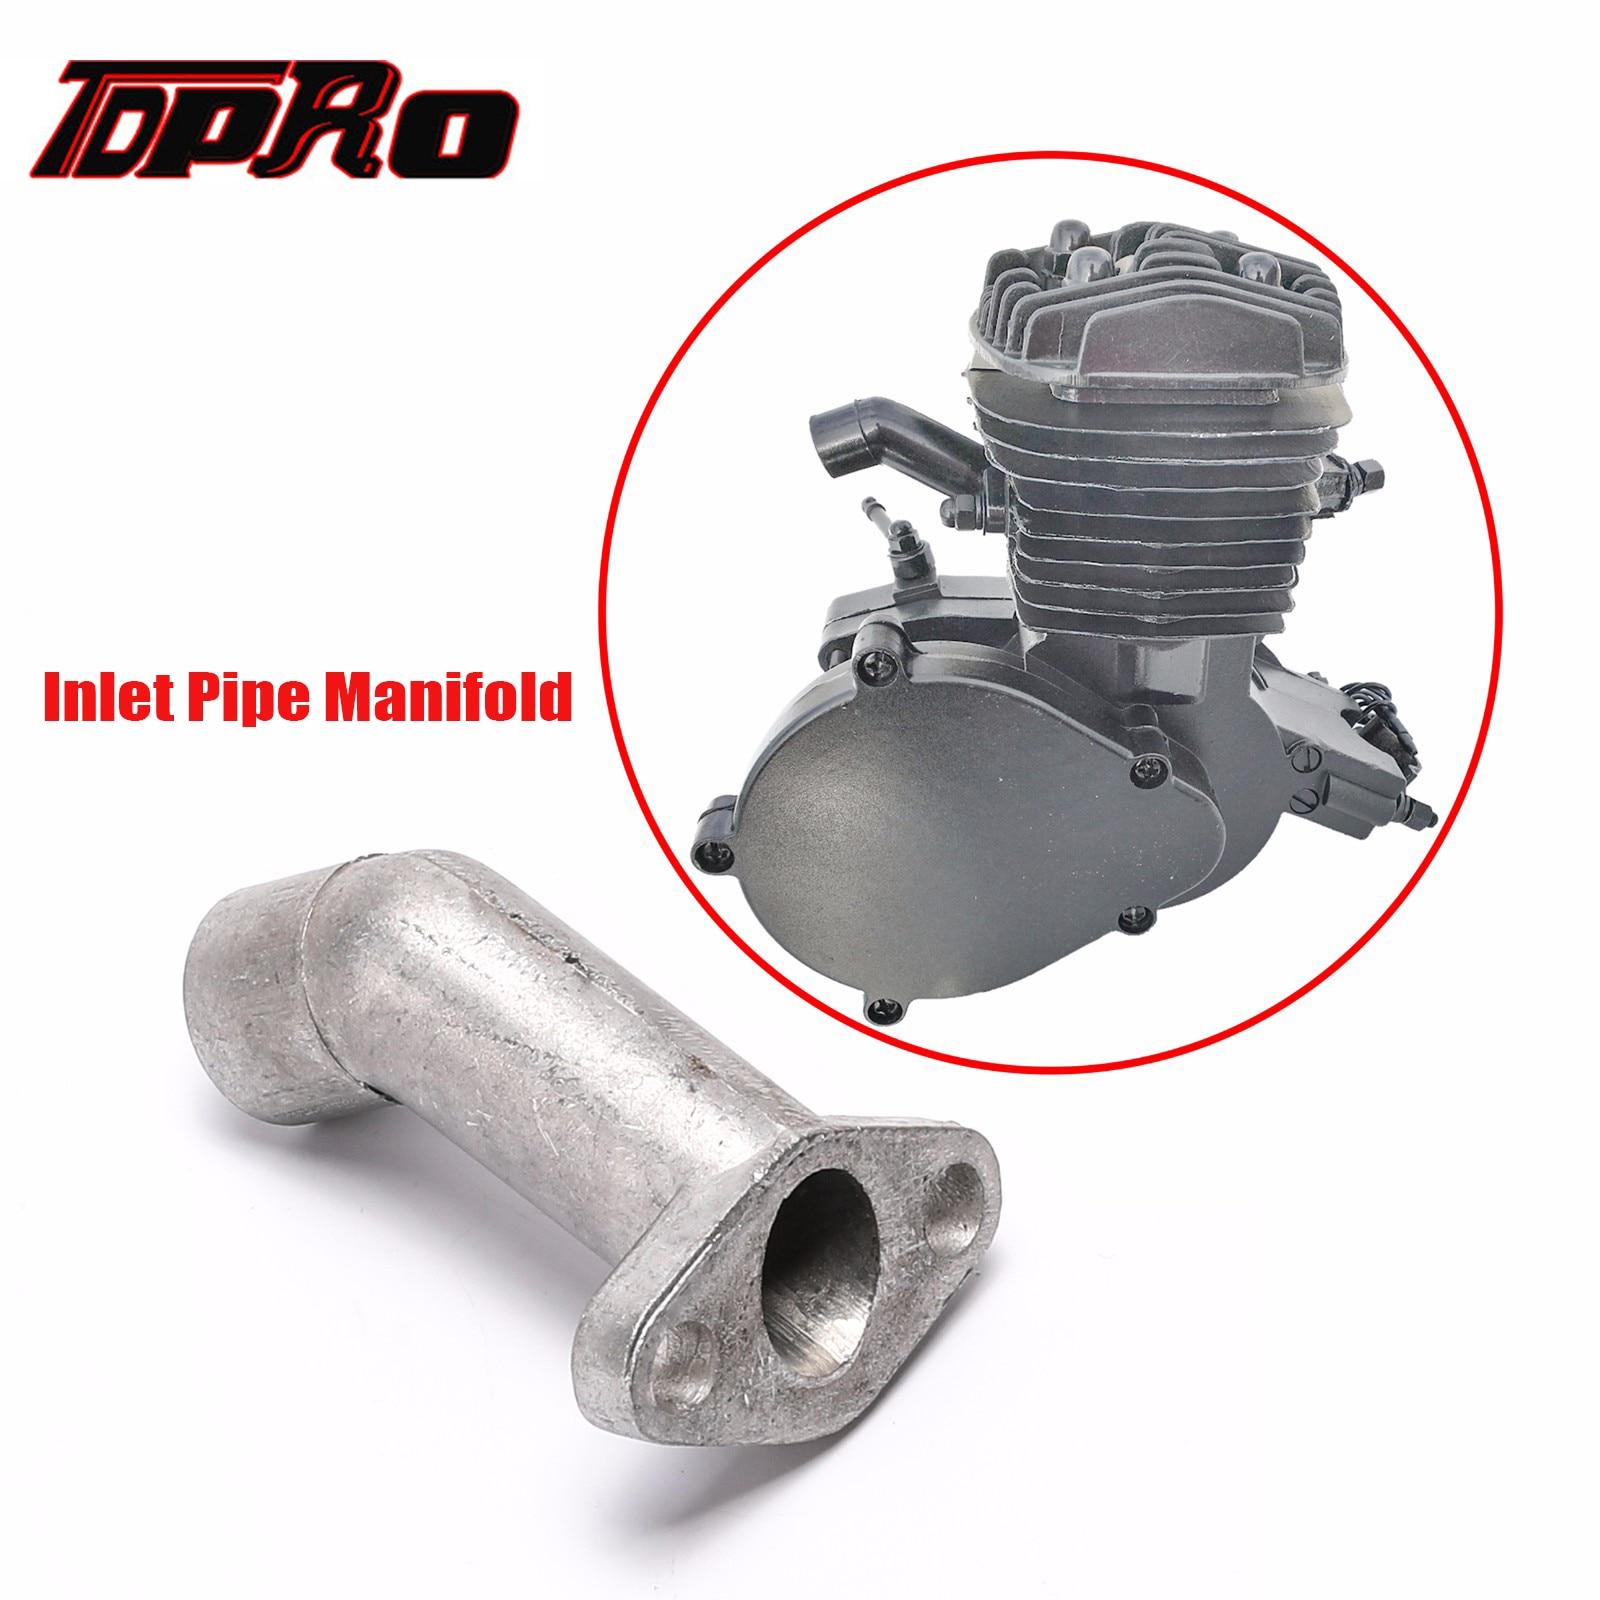 TDPRO Carburetor Short Offset Exhaust & Inlet Pipe Intake Manifold For 43cc 47cc 49cc 66cc 80cc 2 Stroke Motorized Bicycle Bike